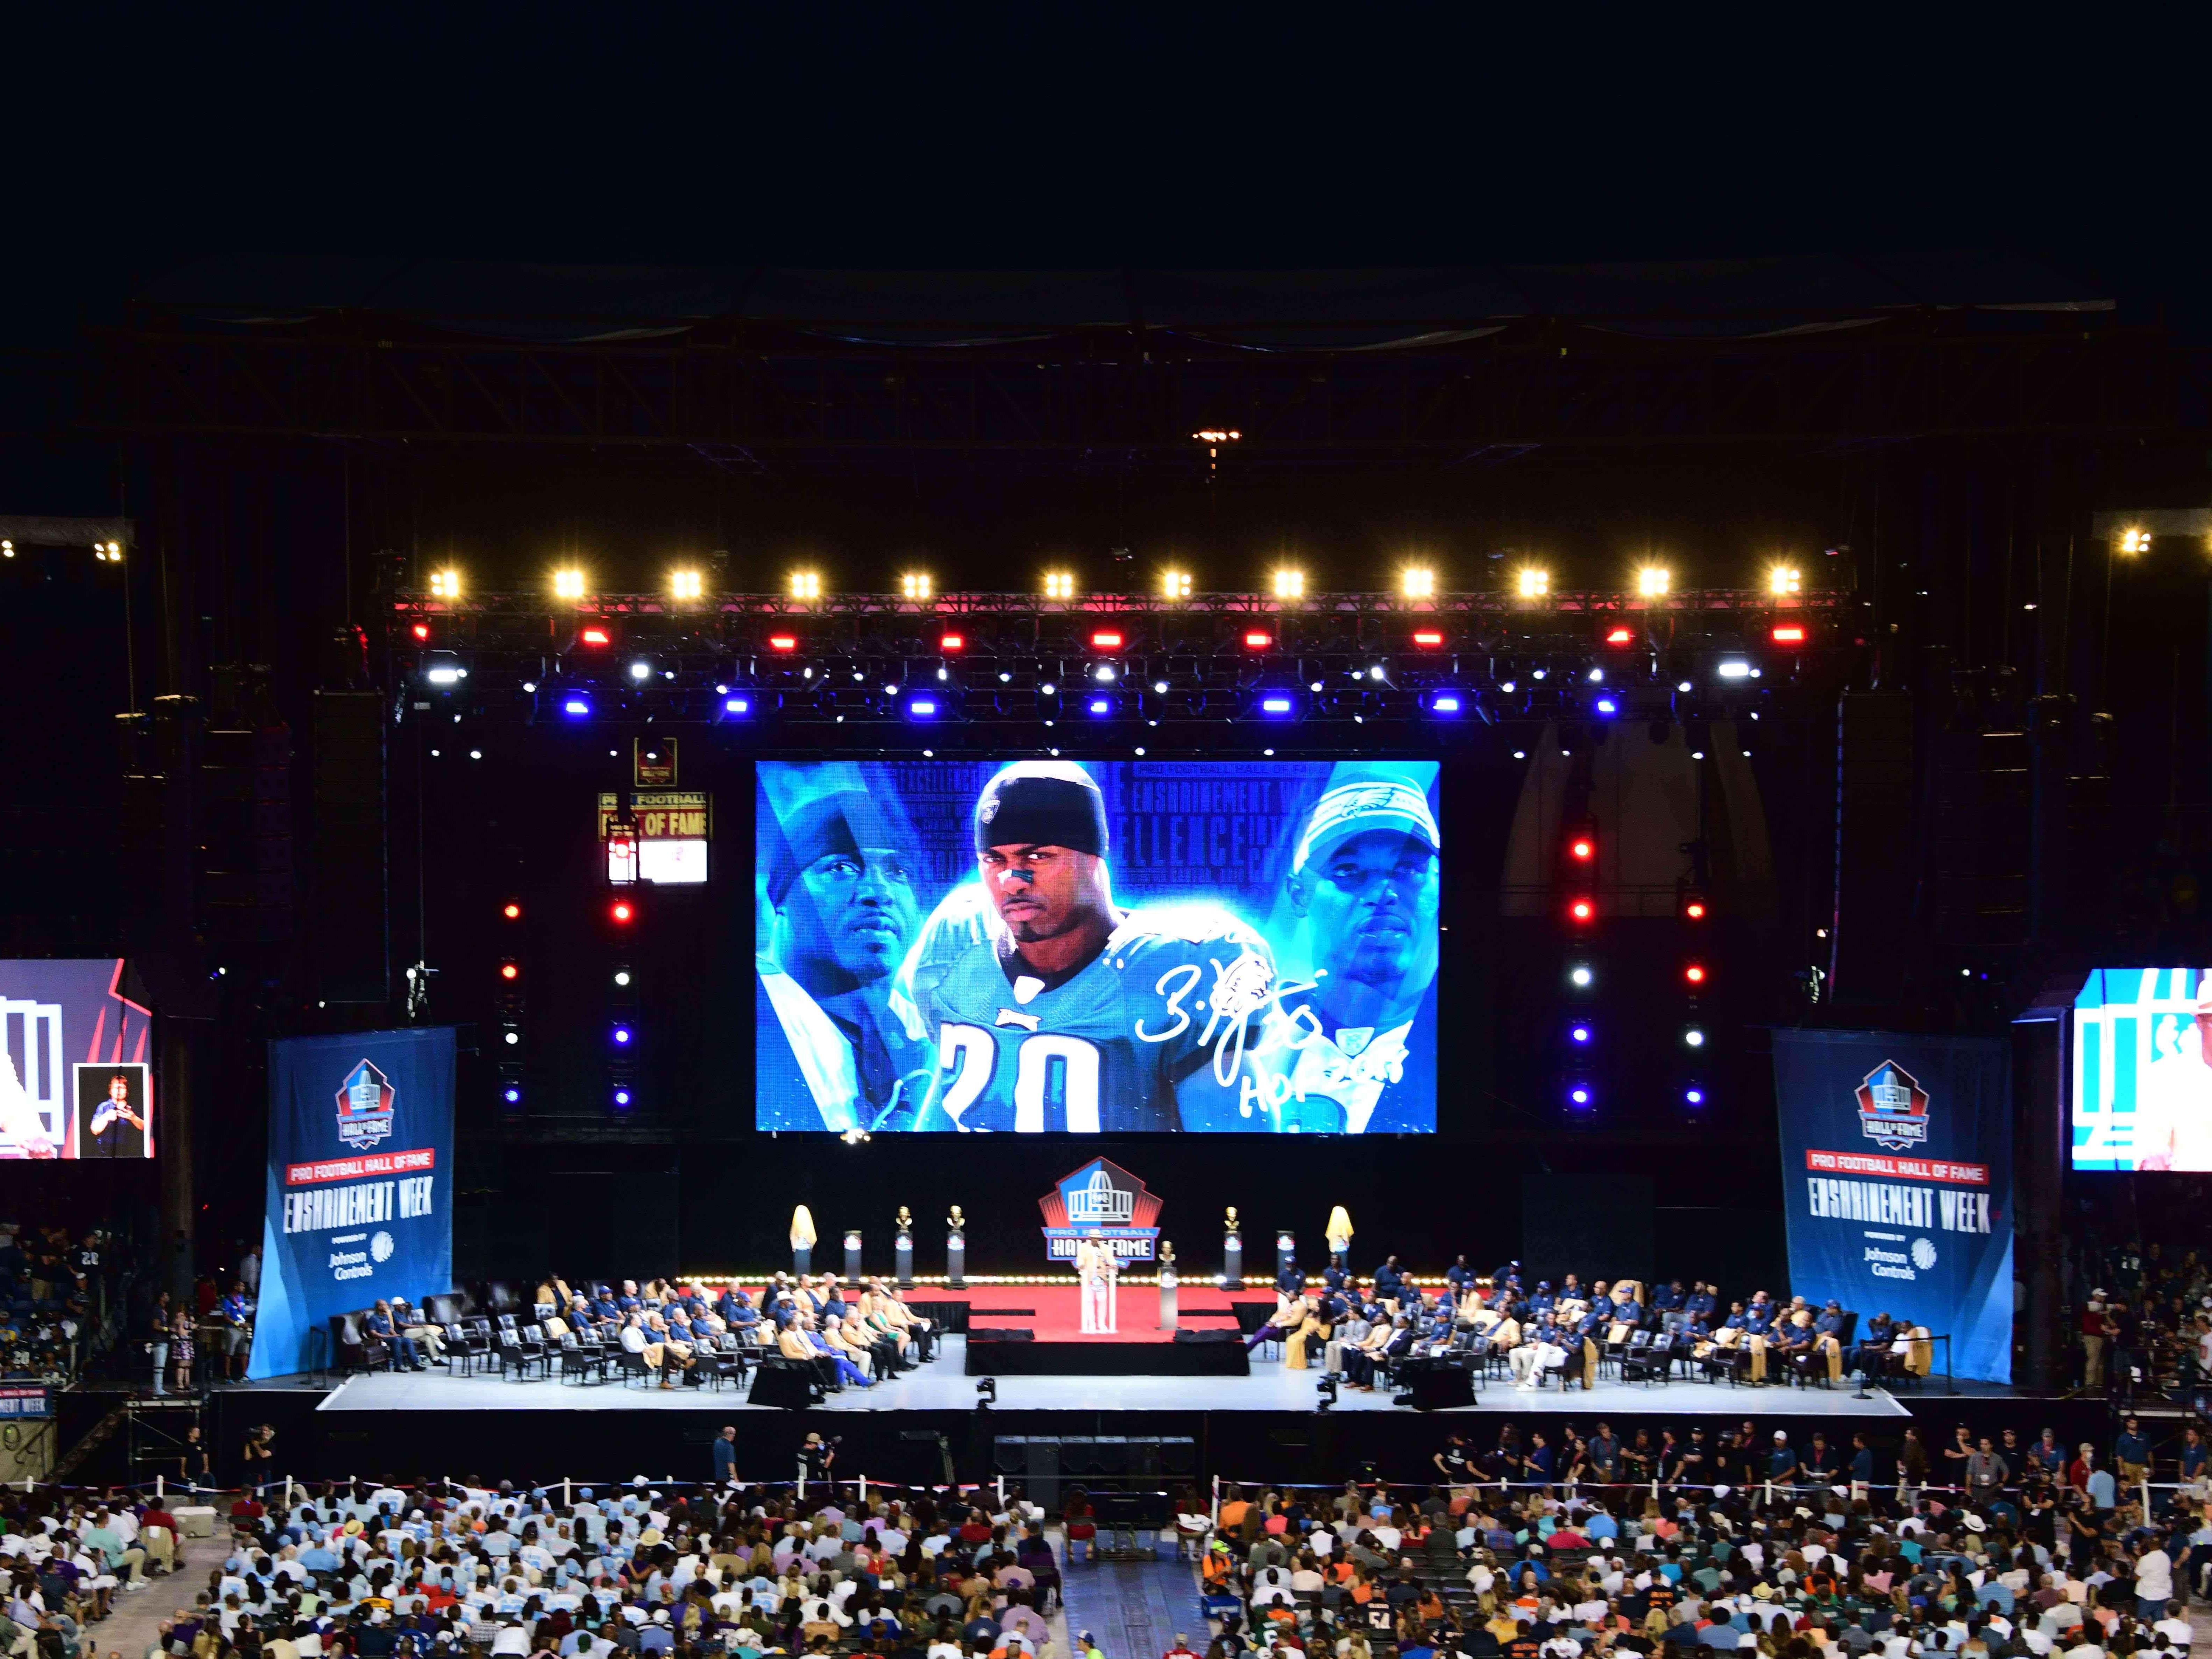 Former Philadelphia Eagle and Denver Broncos safety Brian Dawkins speaks during the Pro Football Hall of Fame Enshrinement Ceremony at Tom Bensen Stadium.